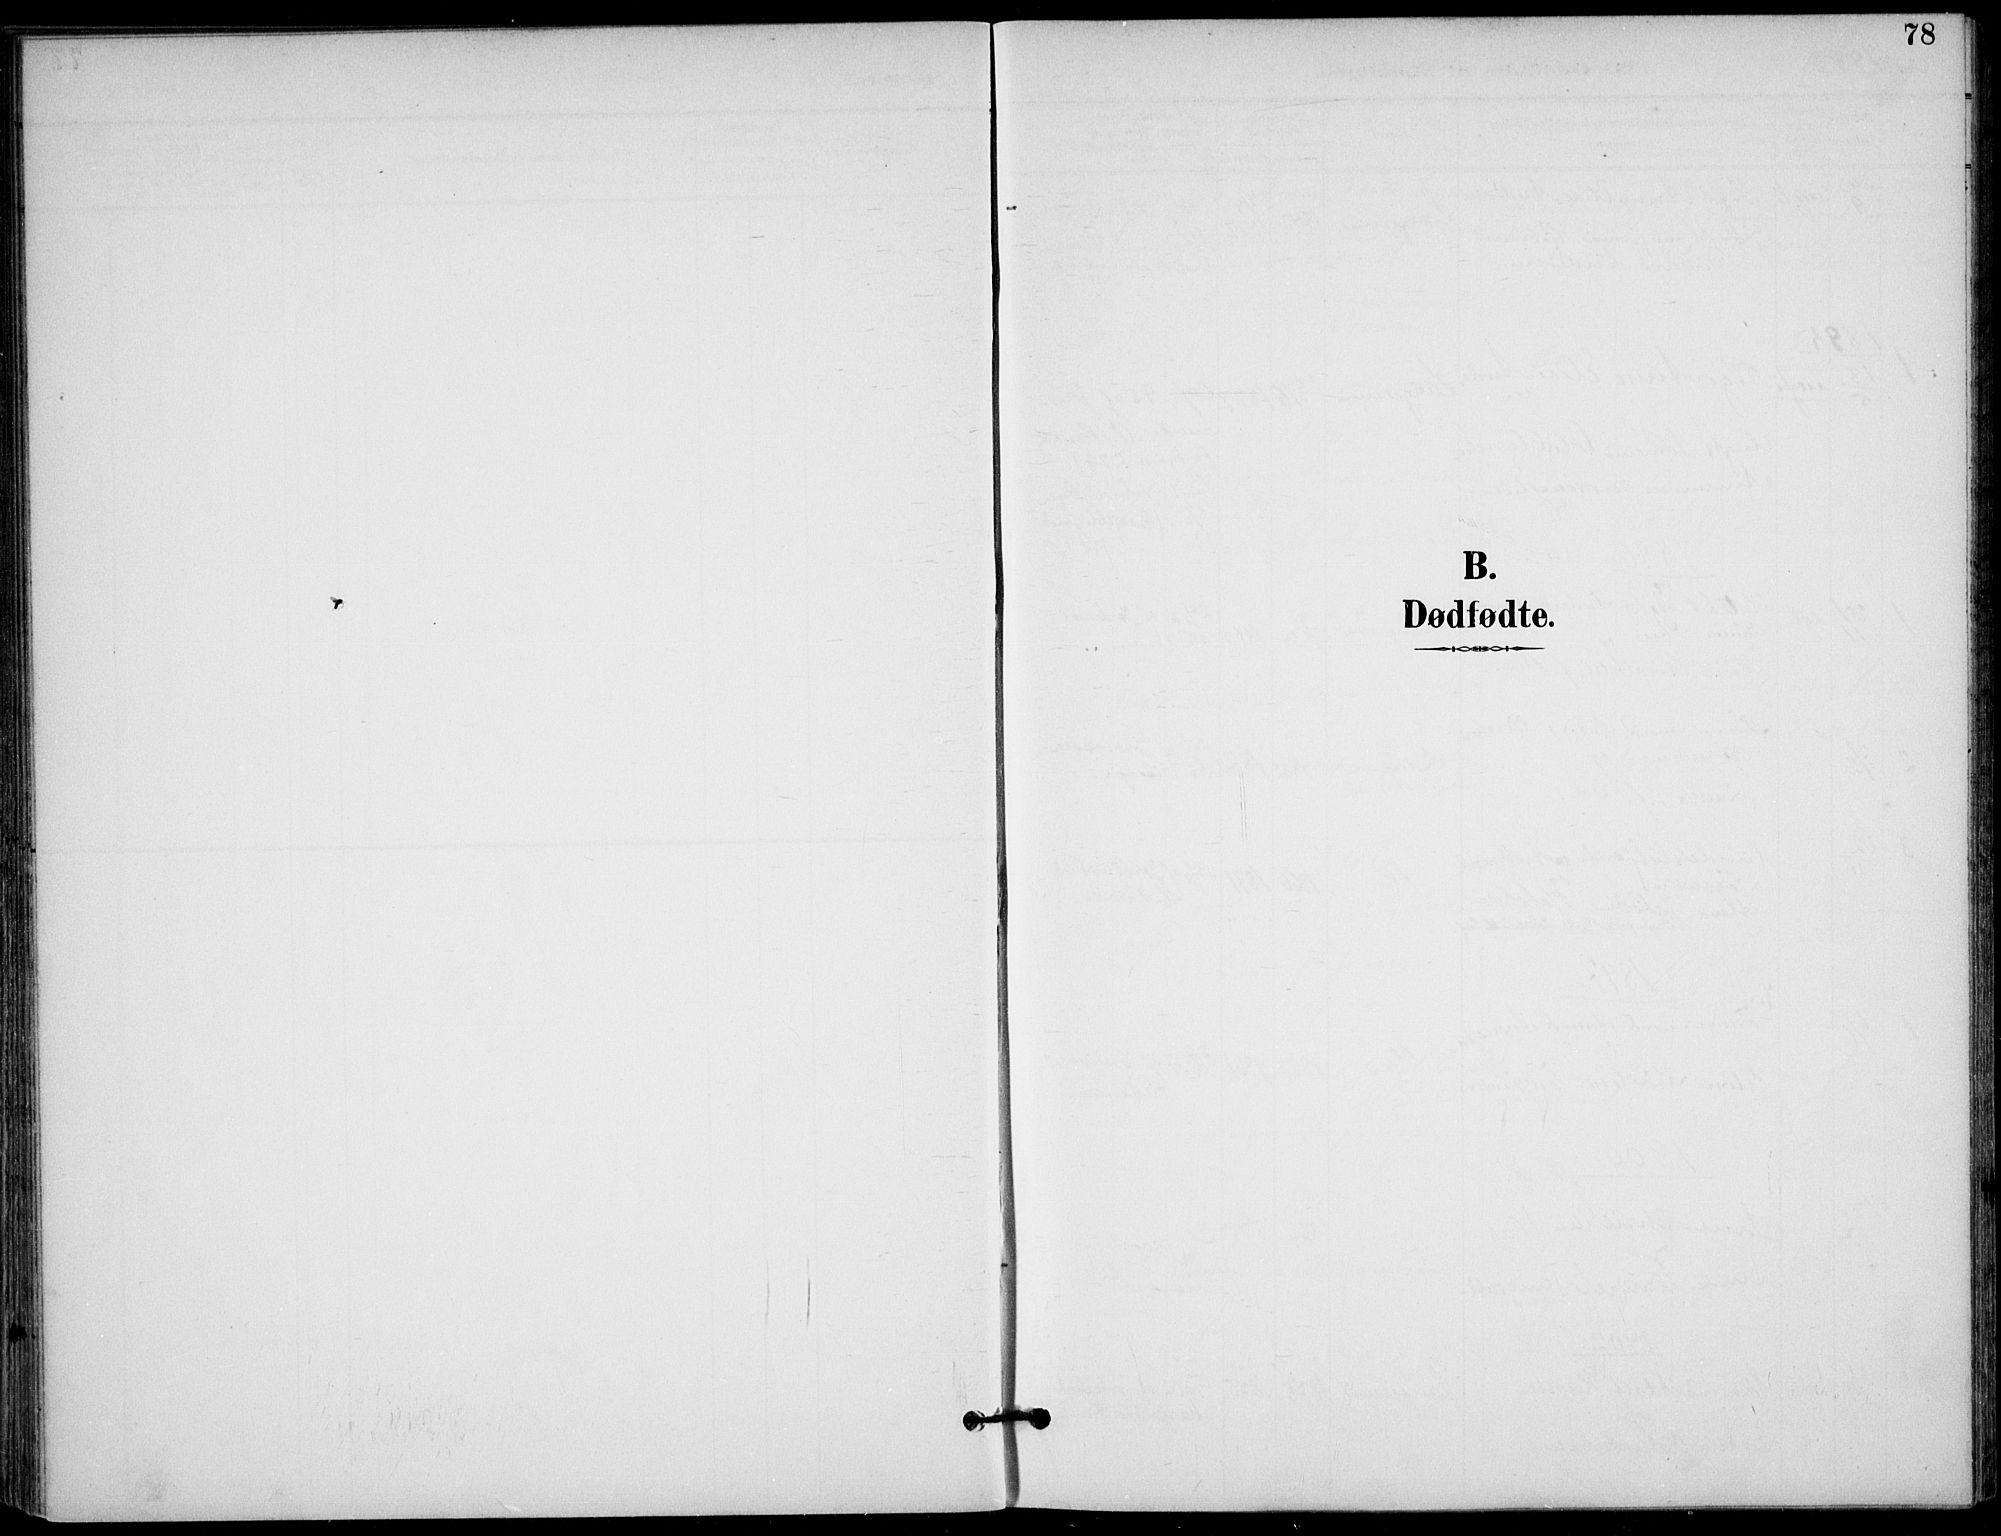 SAKO, Langesund kirkebøker, F/Fa/L0003: Ministerialbok nr. 3, 1893-1907, s. 78